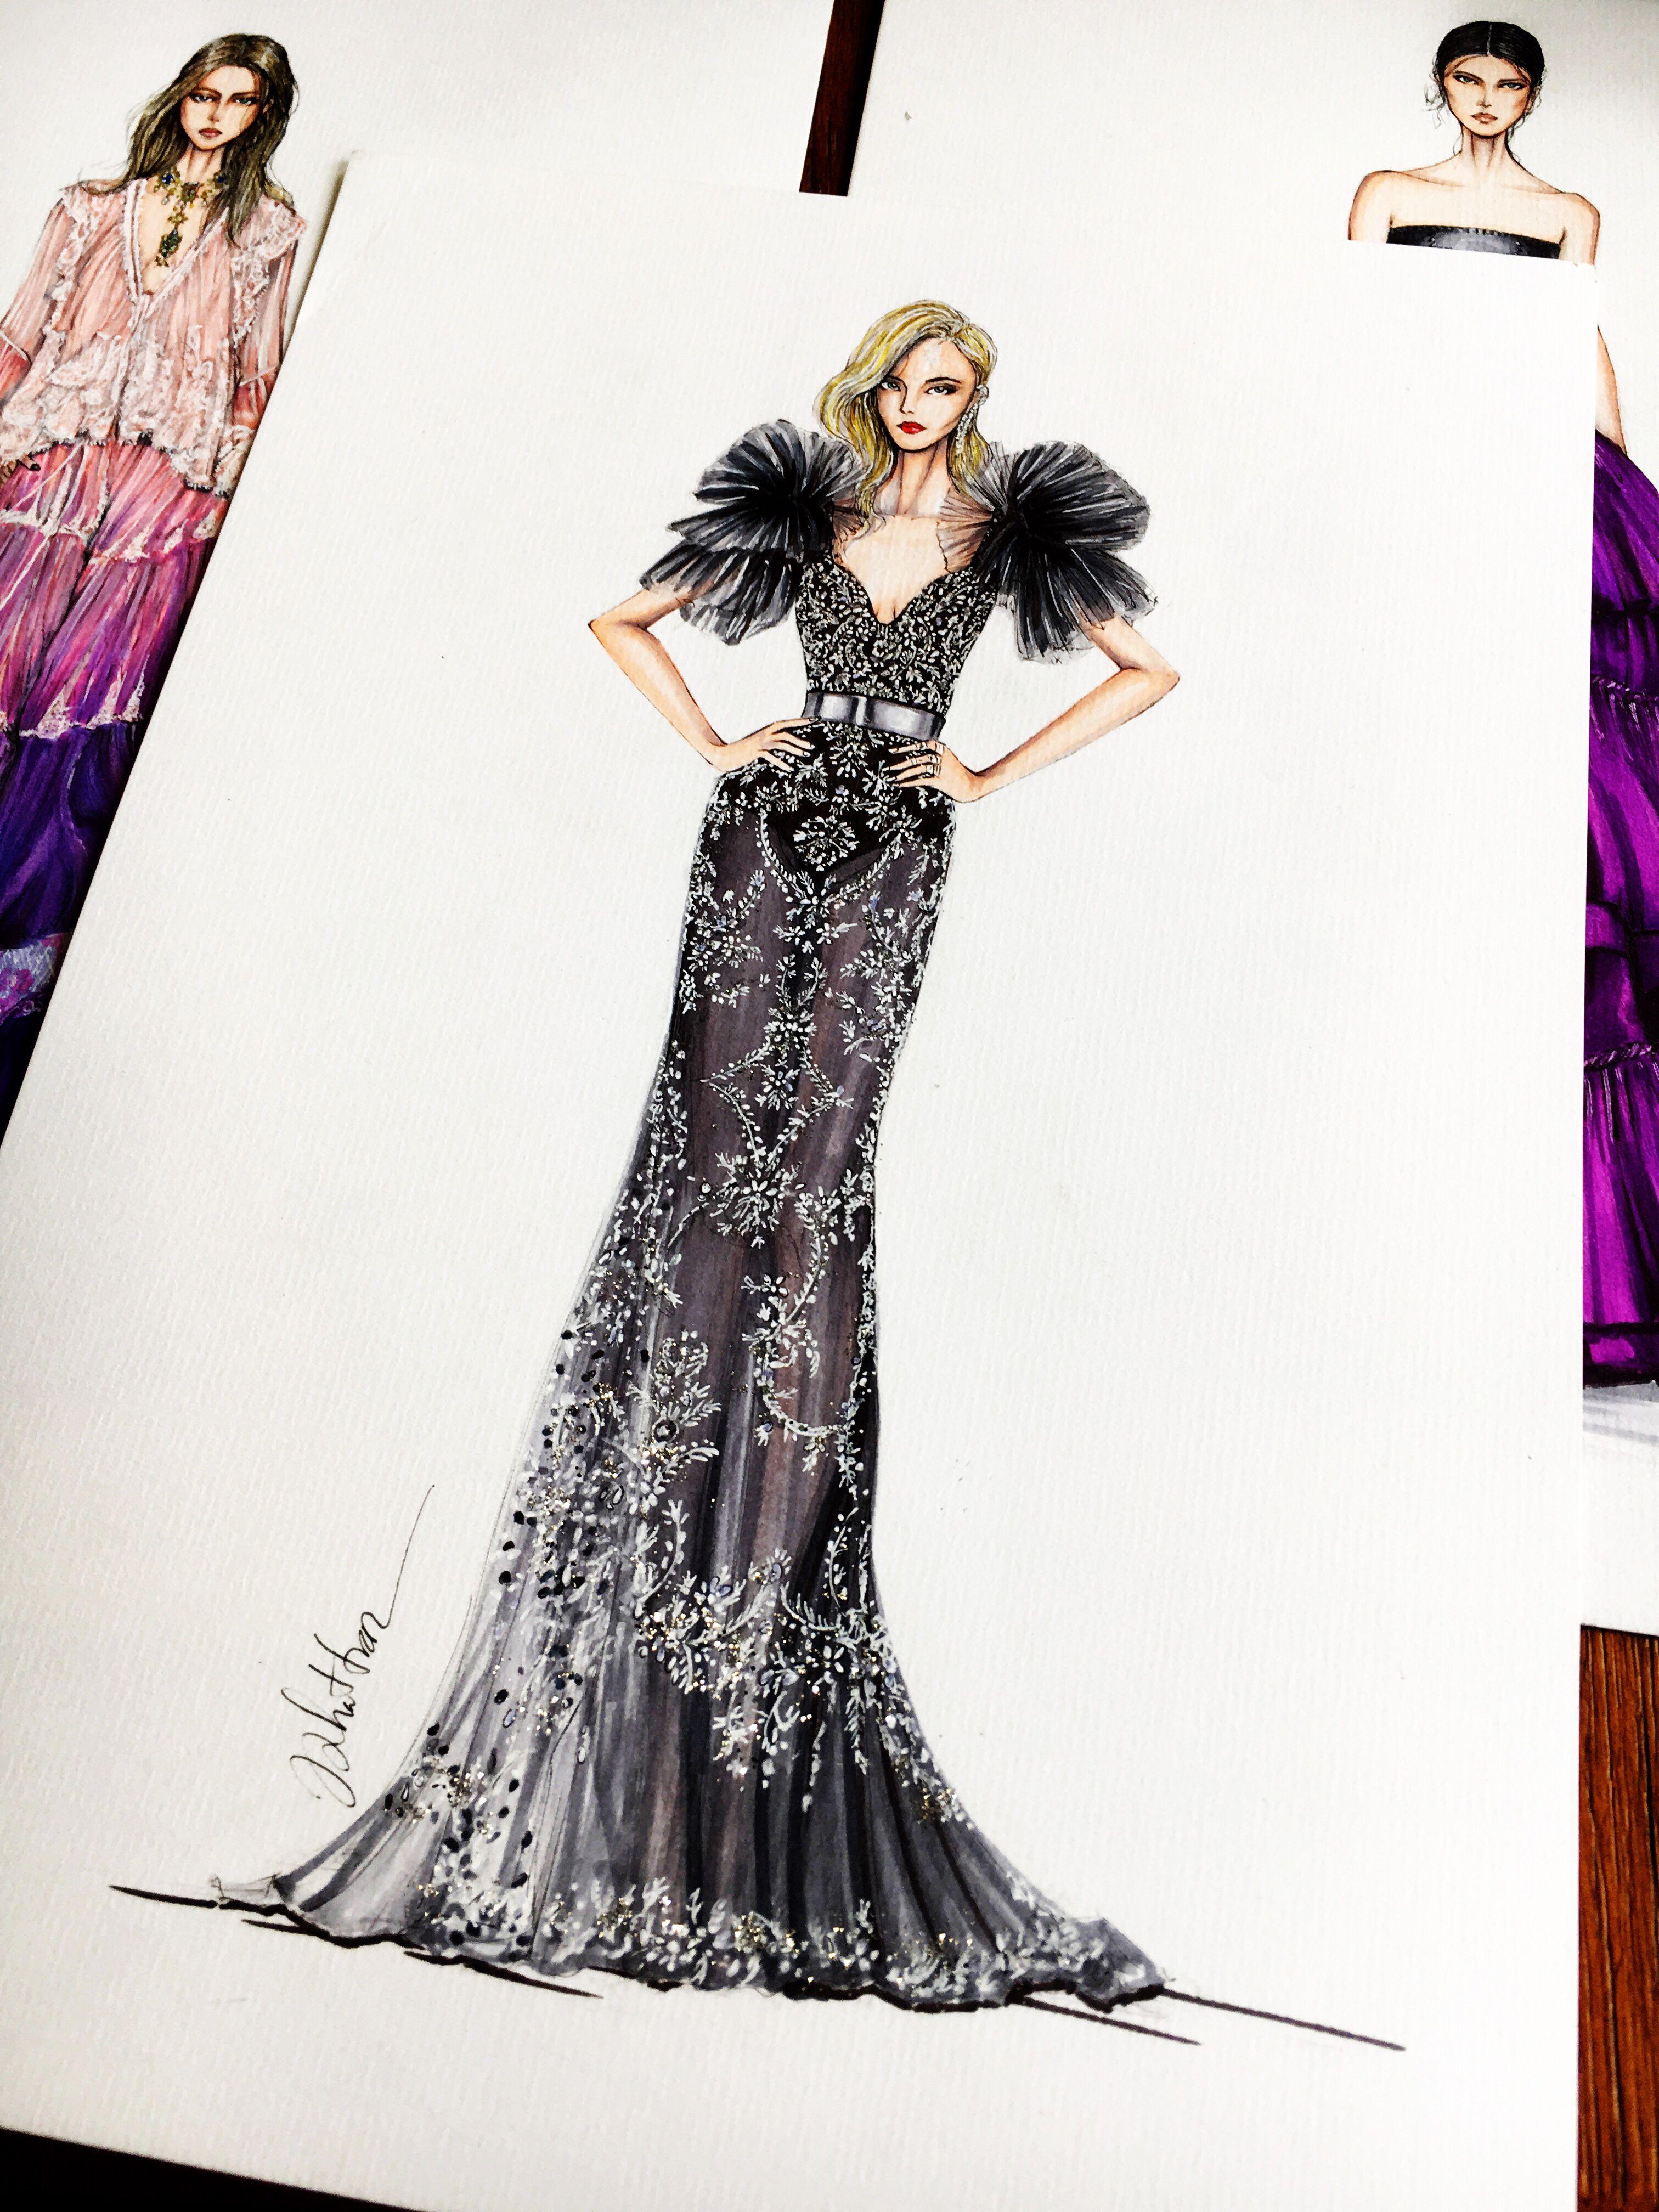 Eris Tran On Behance Jadealyciainc Www Jadealycia Com Fashion Illustration Sketches Dresses Fashion Illustration Dresses Fashion Design Sketches